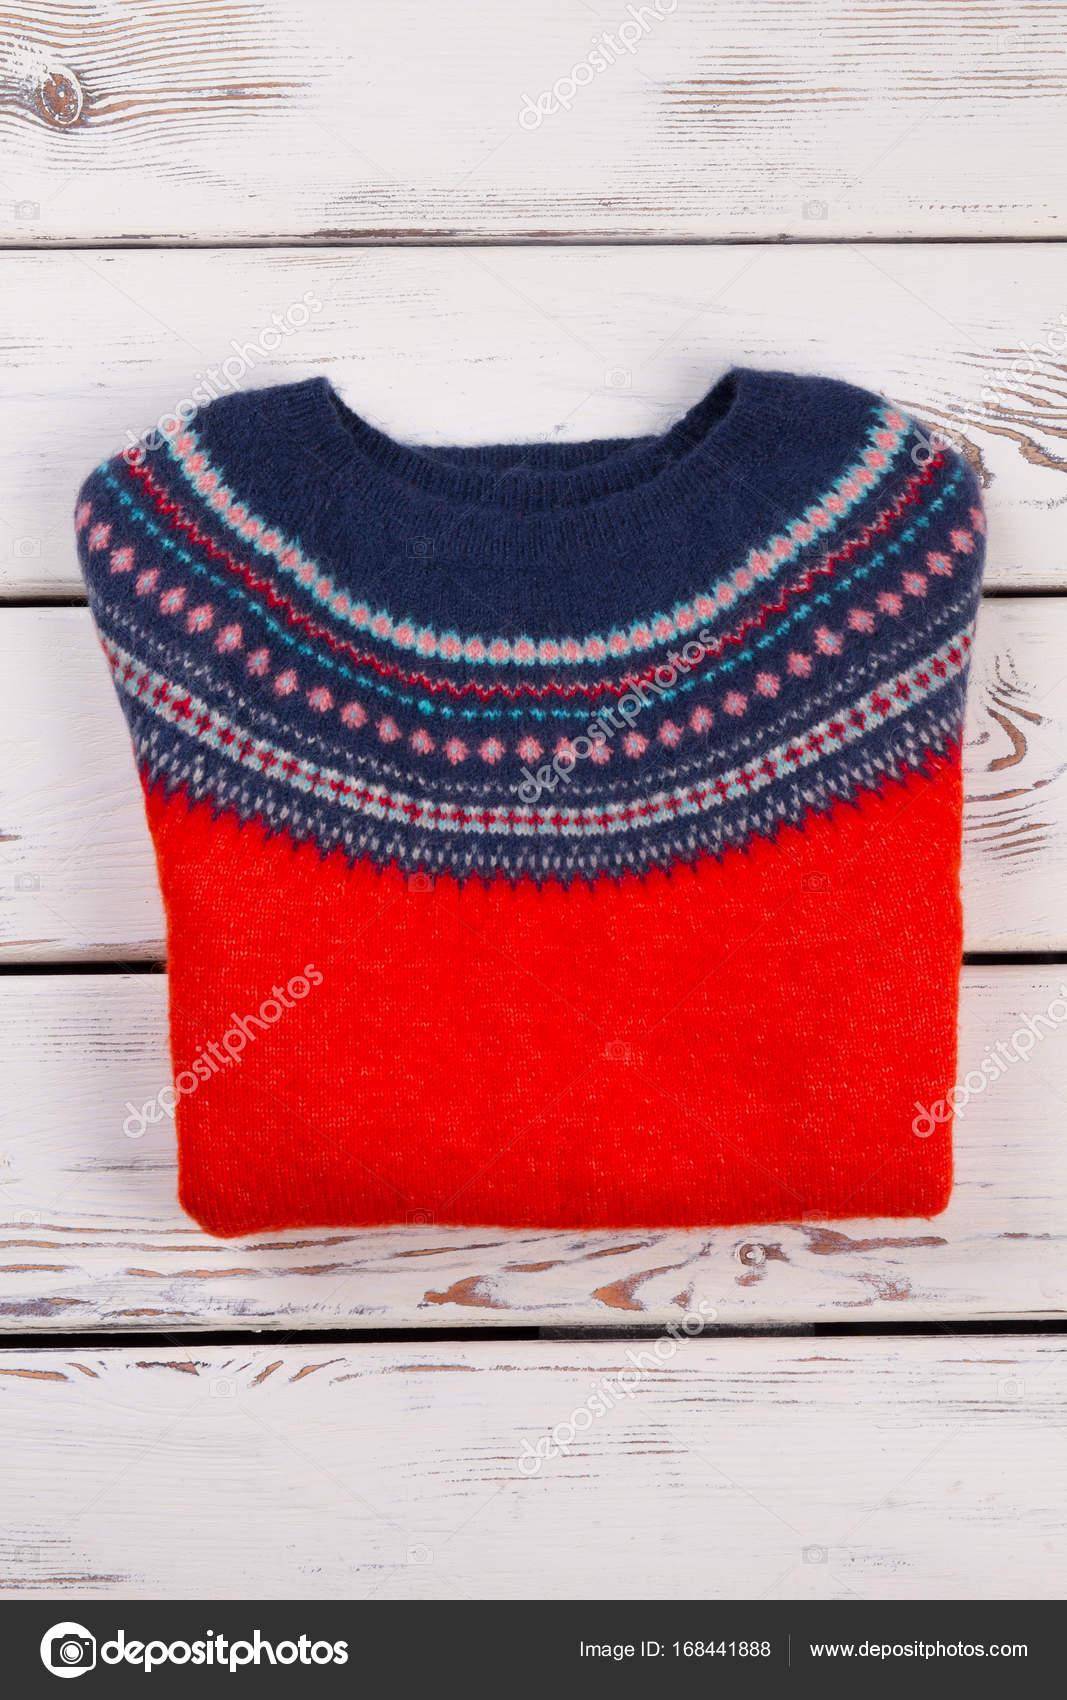 3f1b63919f96 Ισλανδικά-πουλόβερ κόκκινο και μπλε. Μάλλινα χειροποίητα γυναικεία ρούχα σε  λαϊκό ύφος. Διπλωμένο ρούχο σε φόντο ξύλινη — Εικόνα από ...